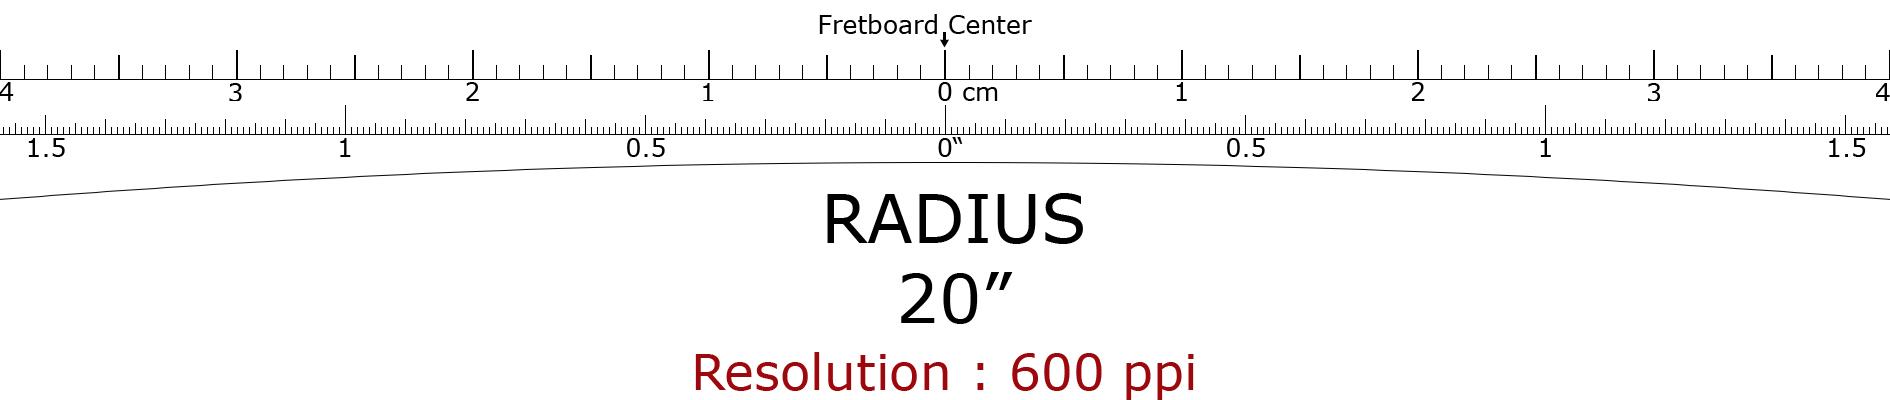 file radius 20 wikimedia commons. Black Bedroom Furniture Sets. Home Design Ideas